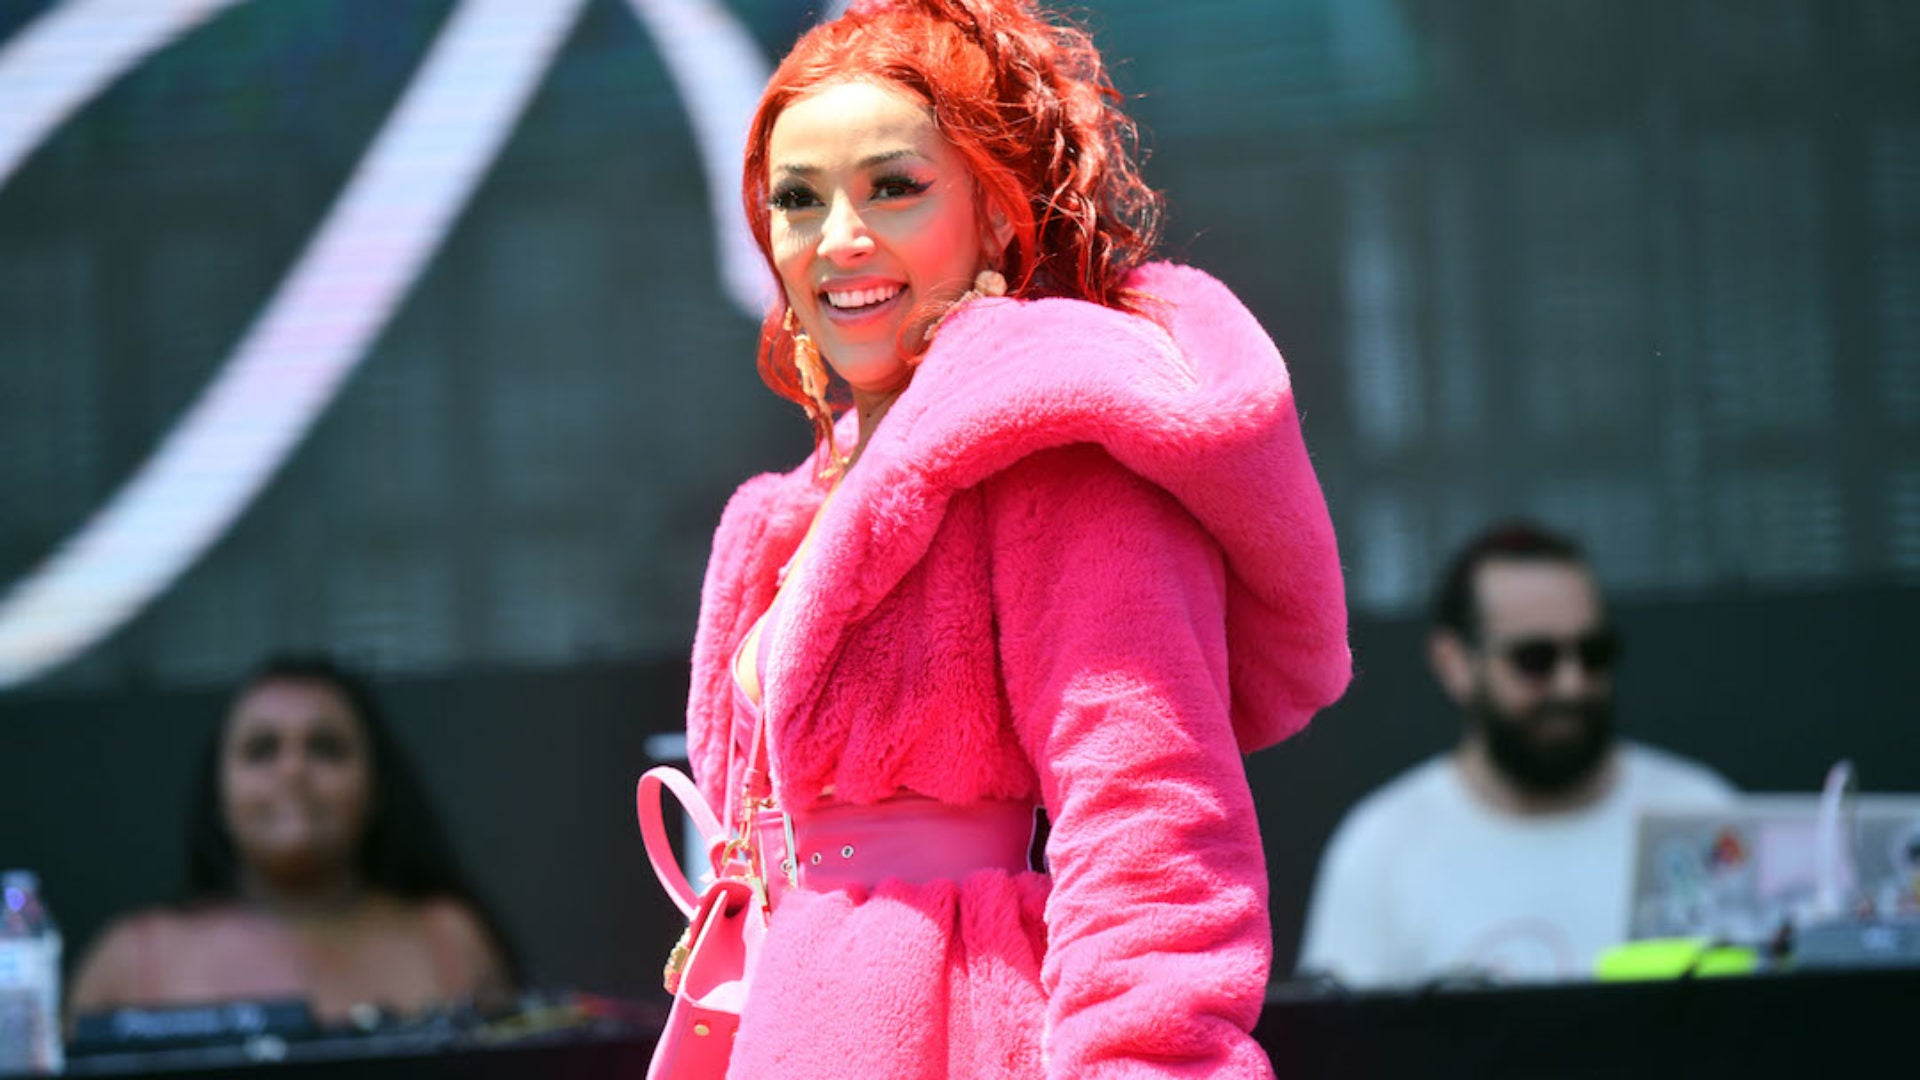 Doja Cat Drops Highly Anticipated Sophomore Album 'Hot Pink'